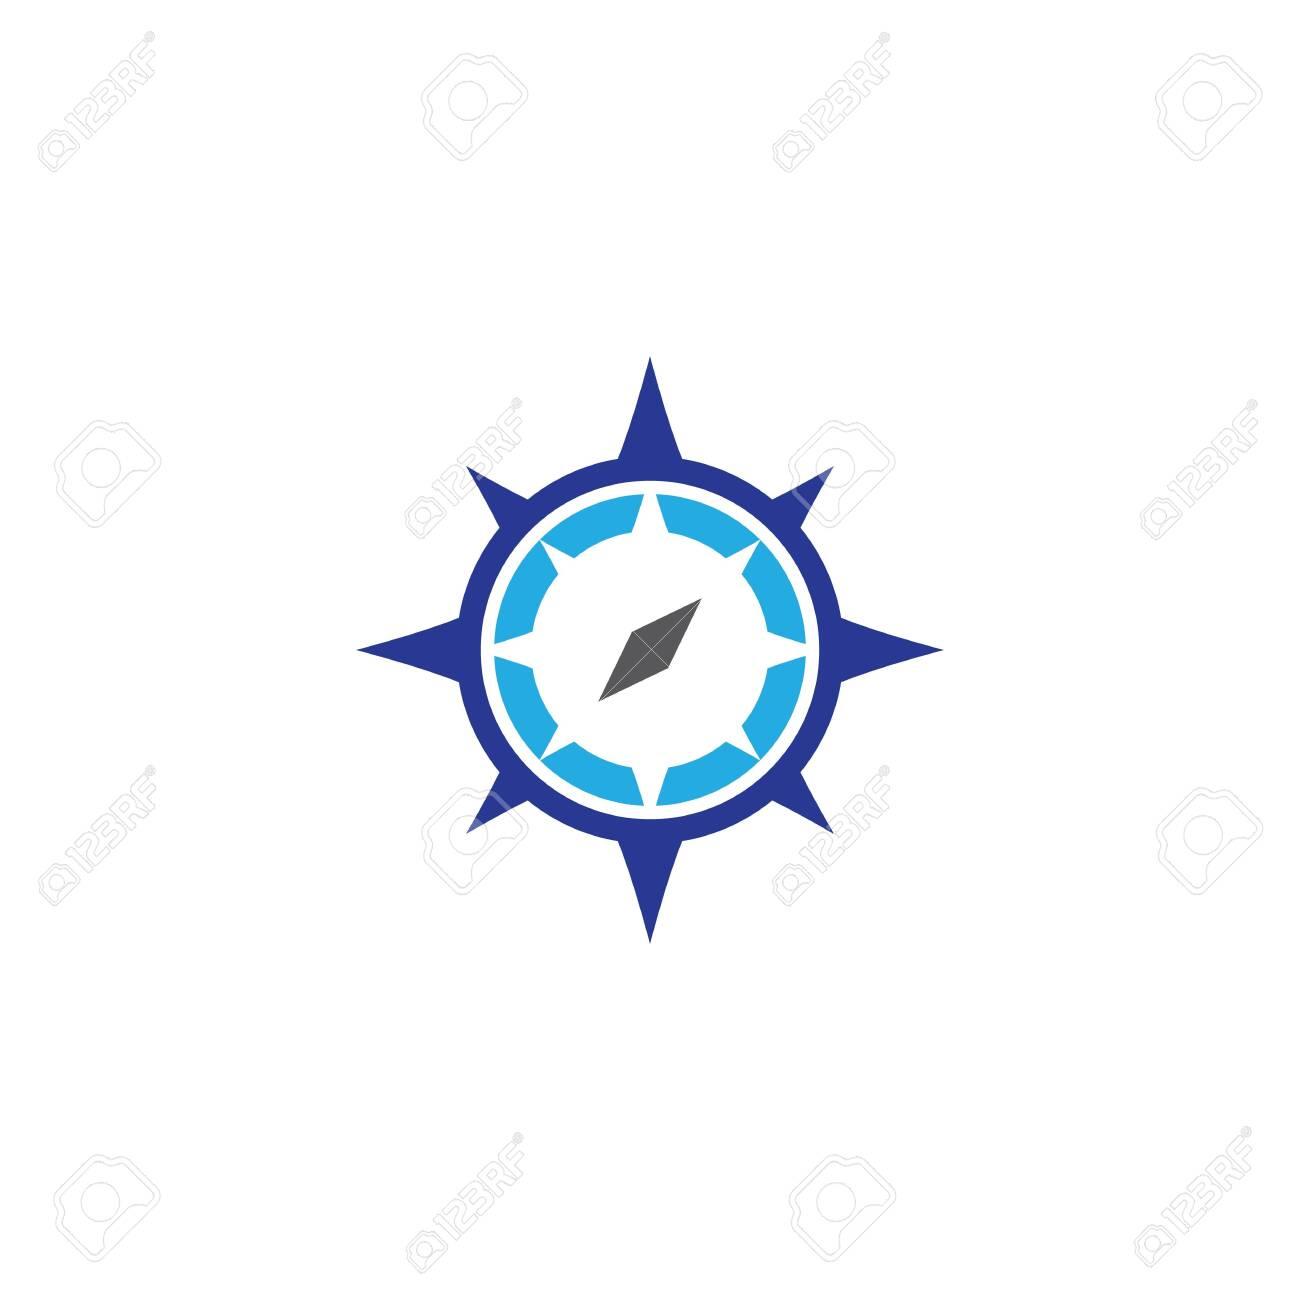 Compass logo template vector icon illustration - 154214249